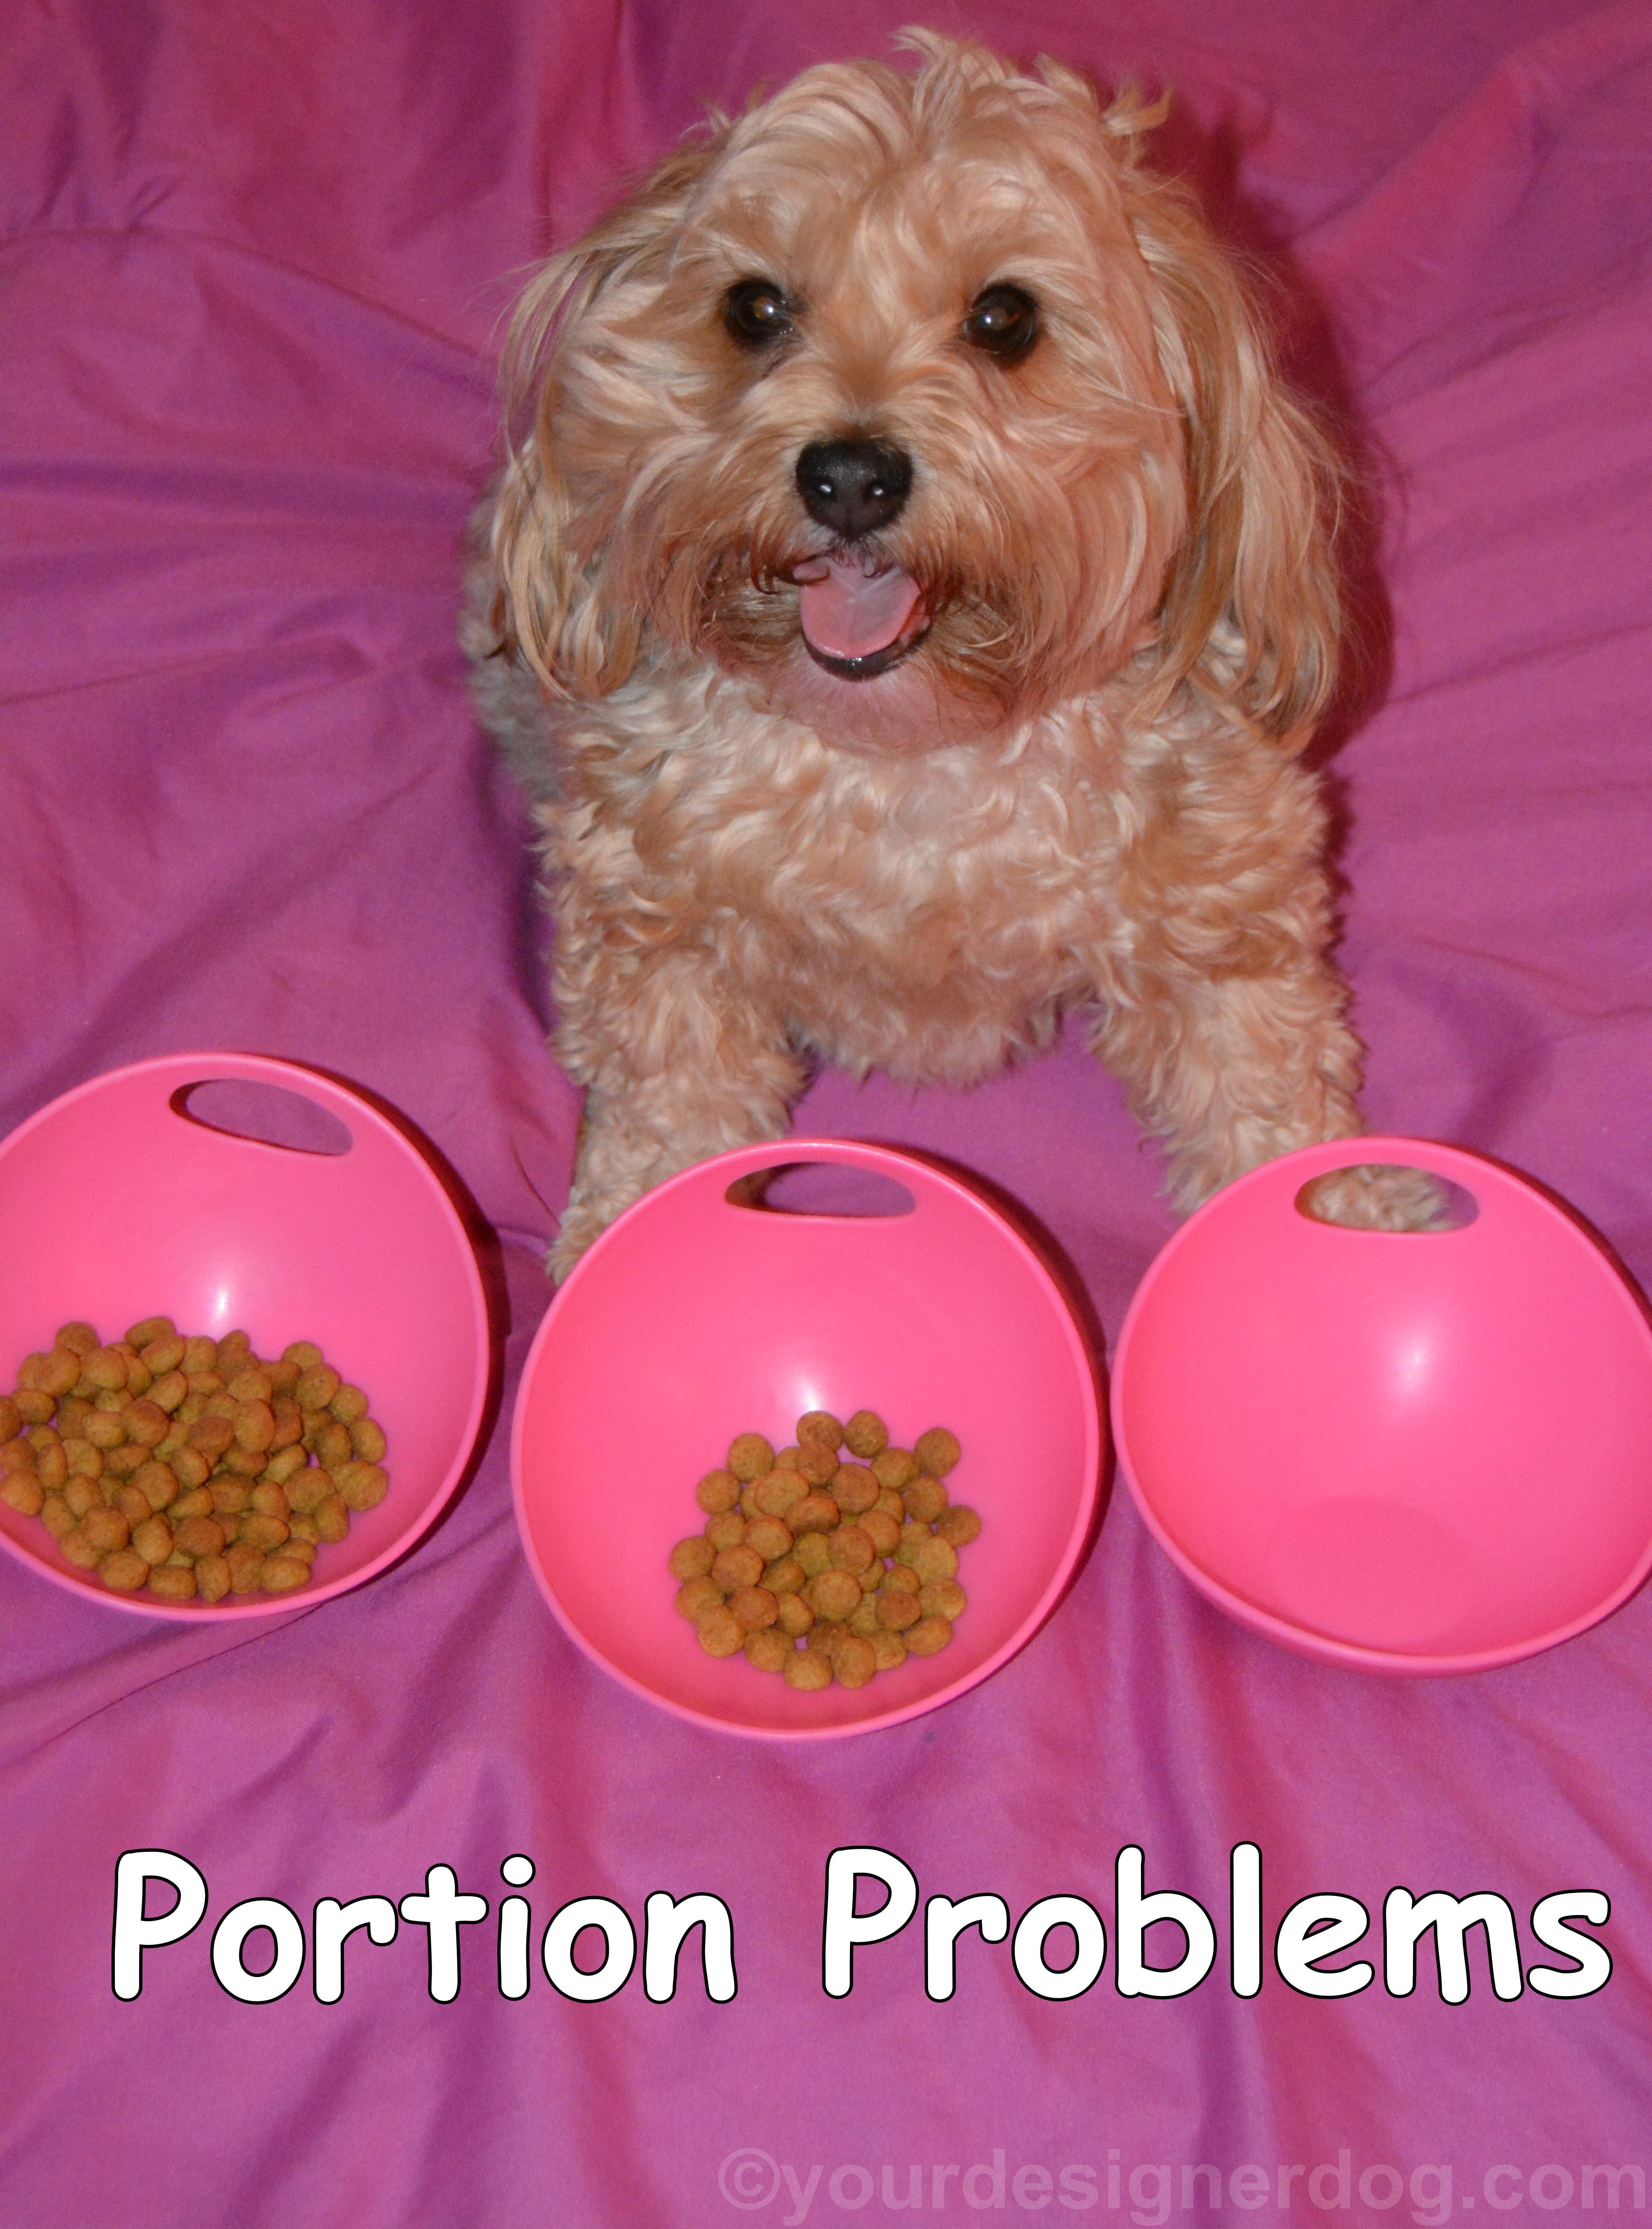 Portion Problems